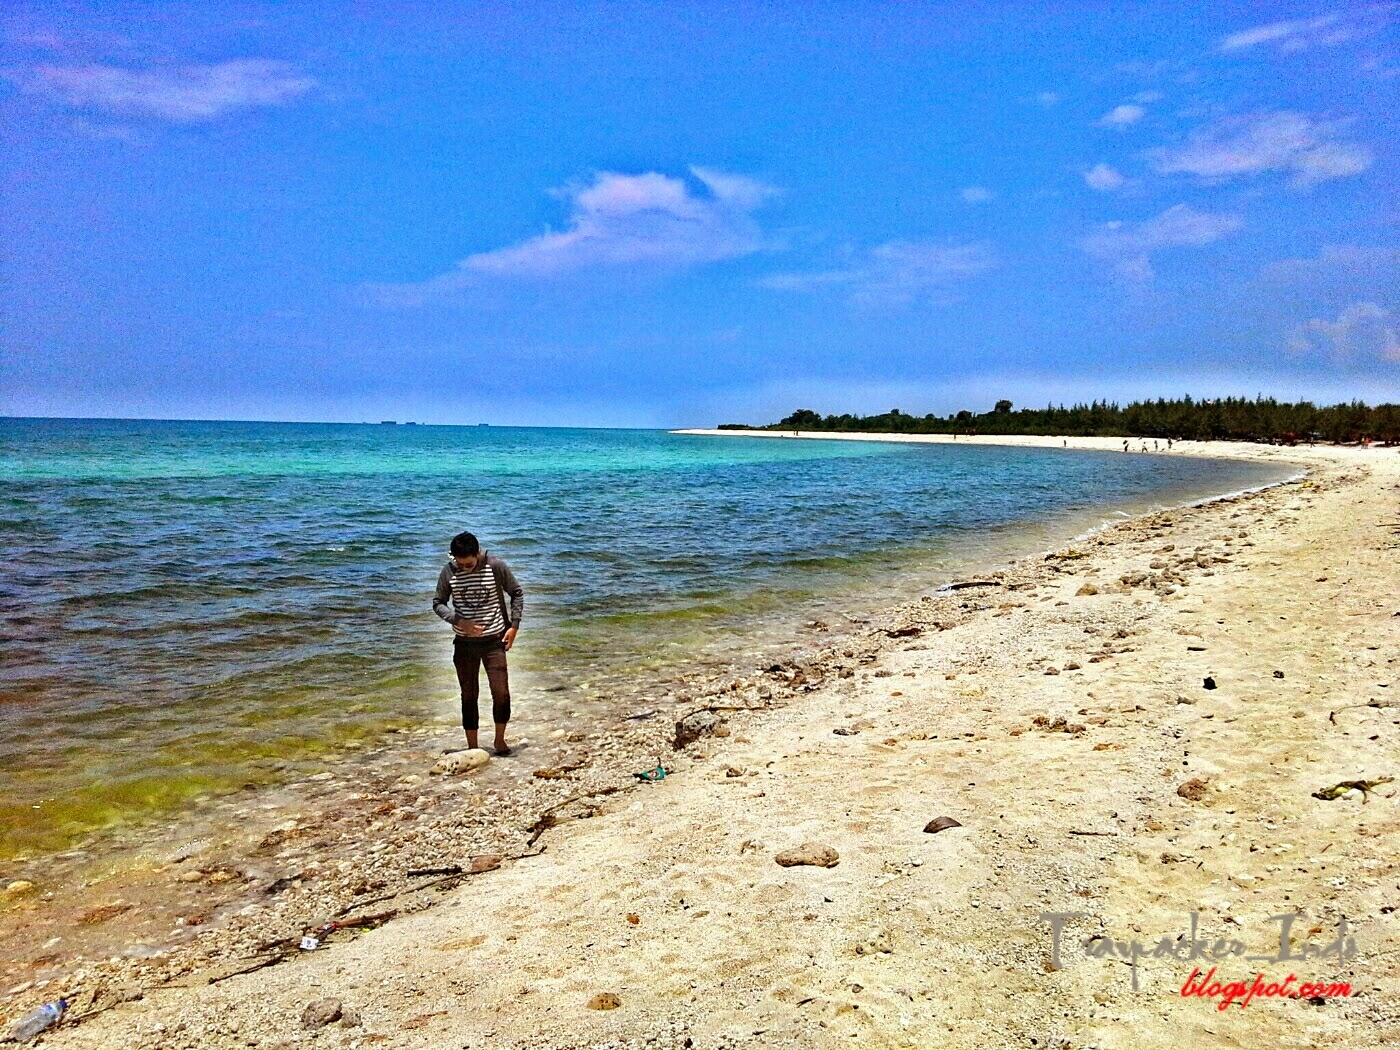 Pantai Pasir Putih Pulau Benteng Lodewijk Mengare Gresik Wisata Tuban